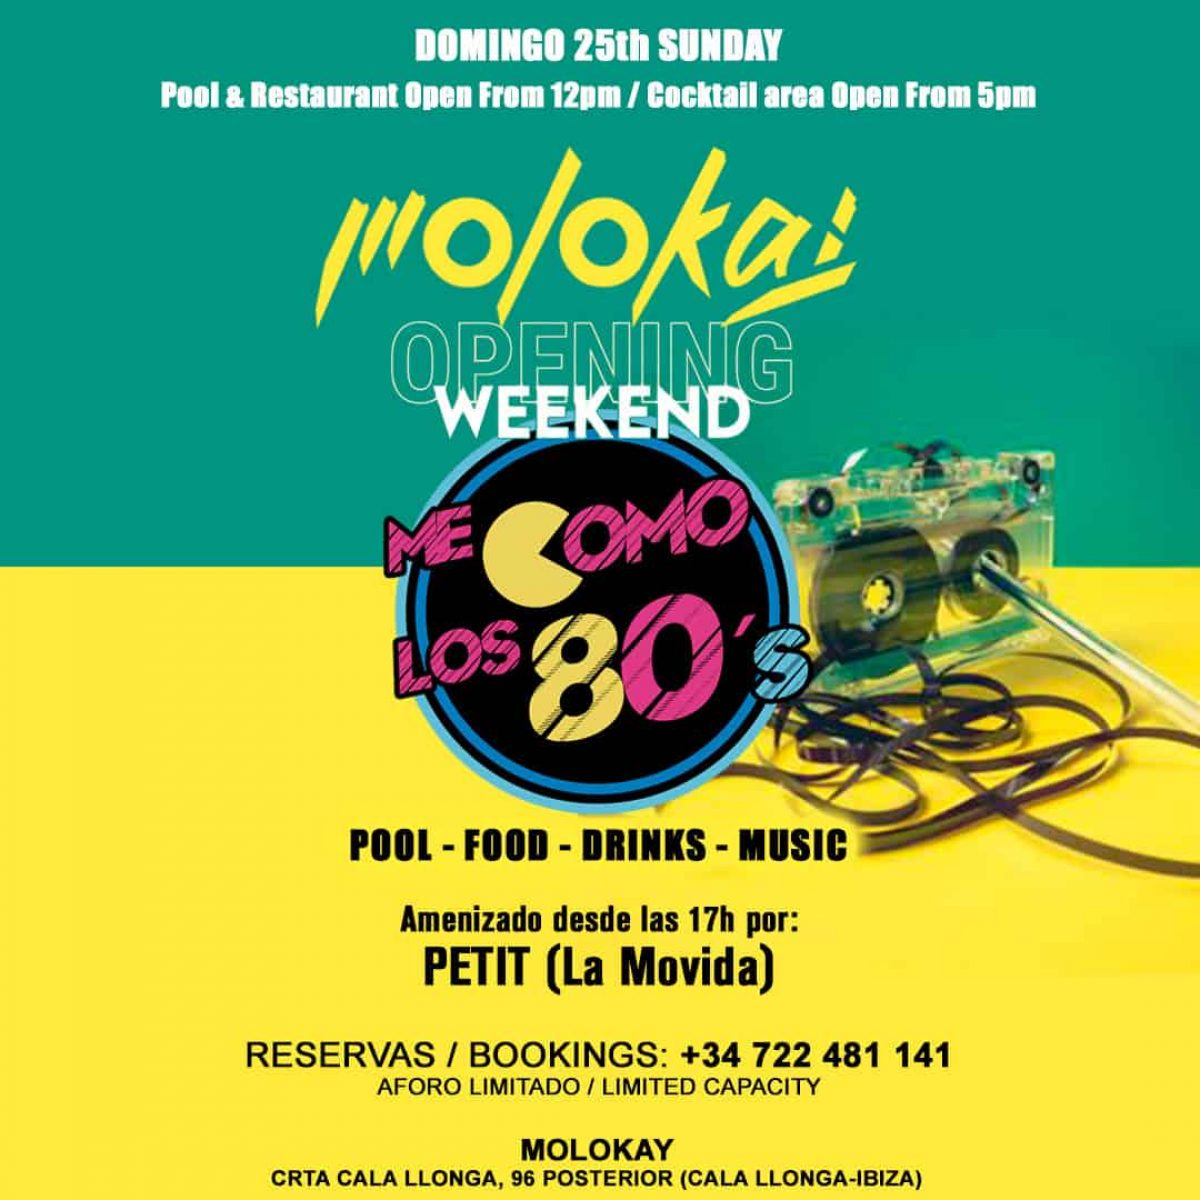 molokay ibiza 80s feest welkomtoibiza